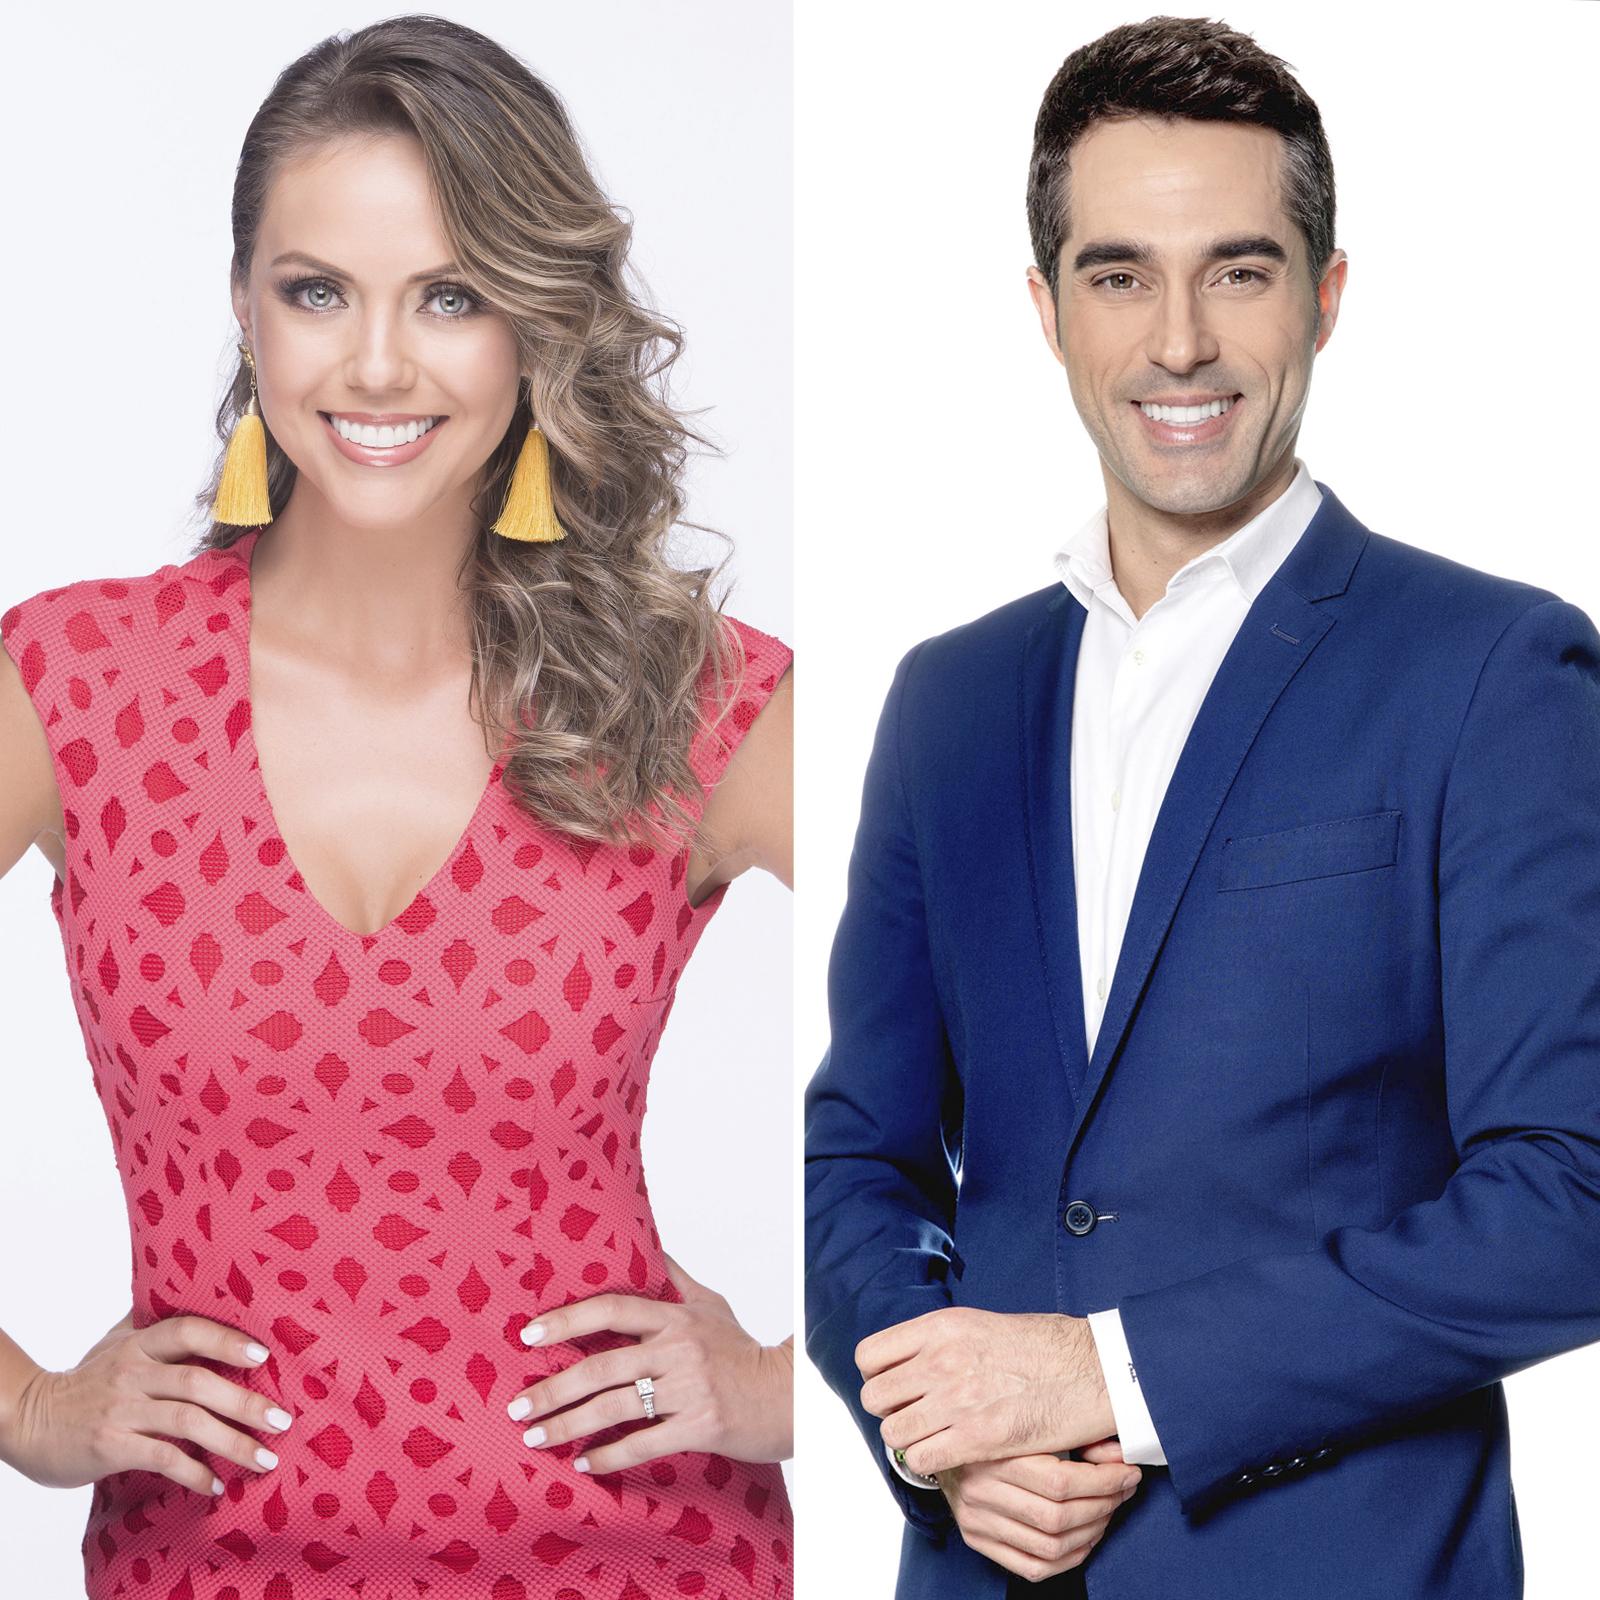 Al Rojo Vivo – Jessica Carrillo y Antonio Texeira